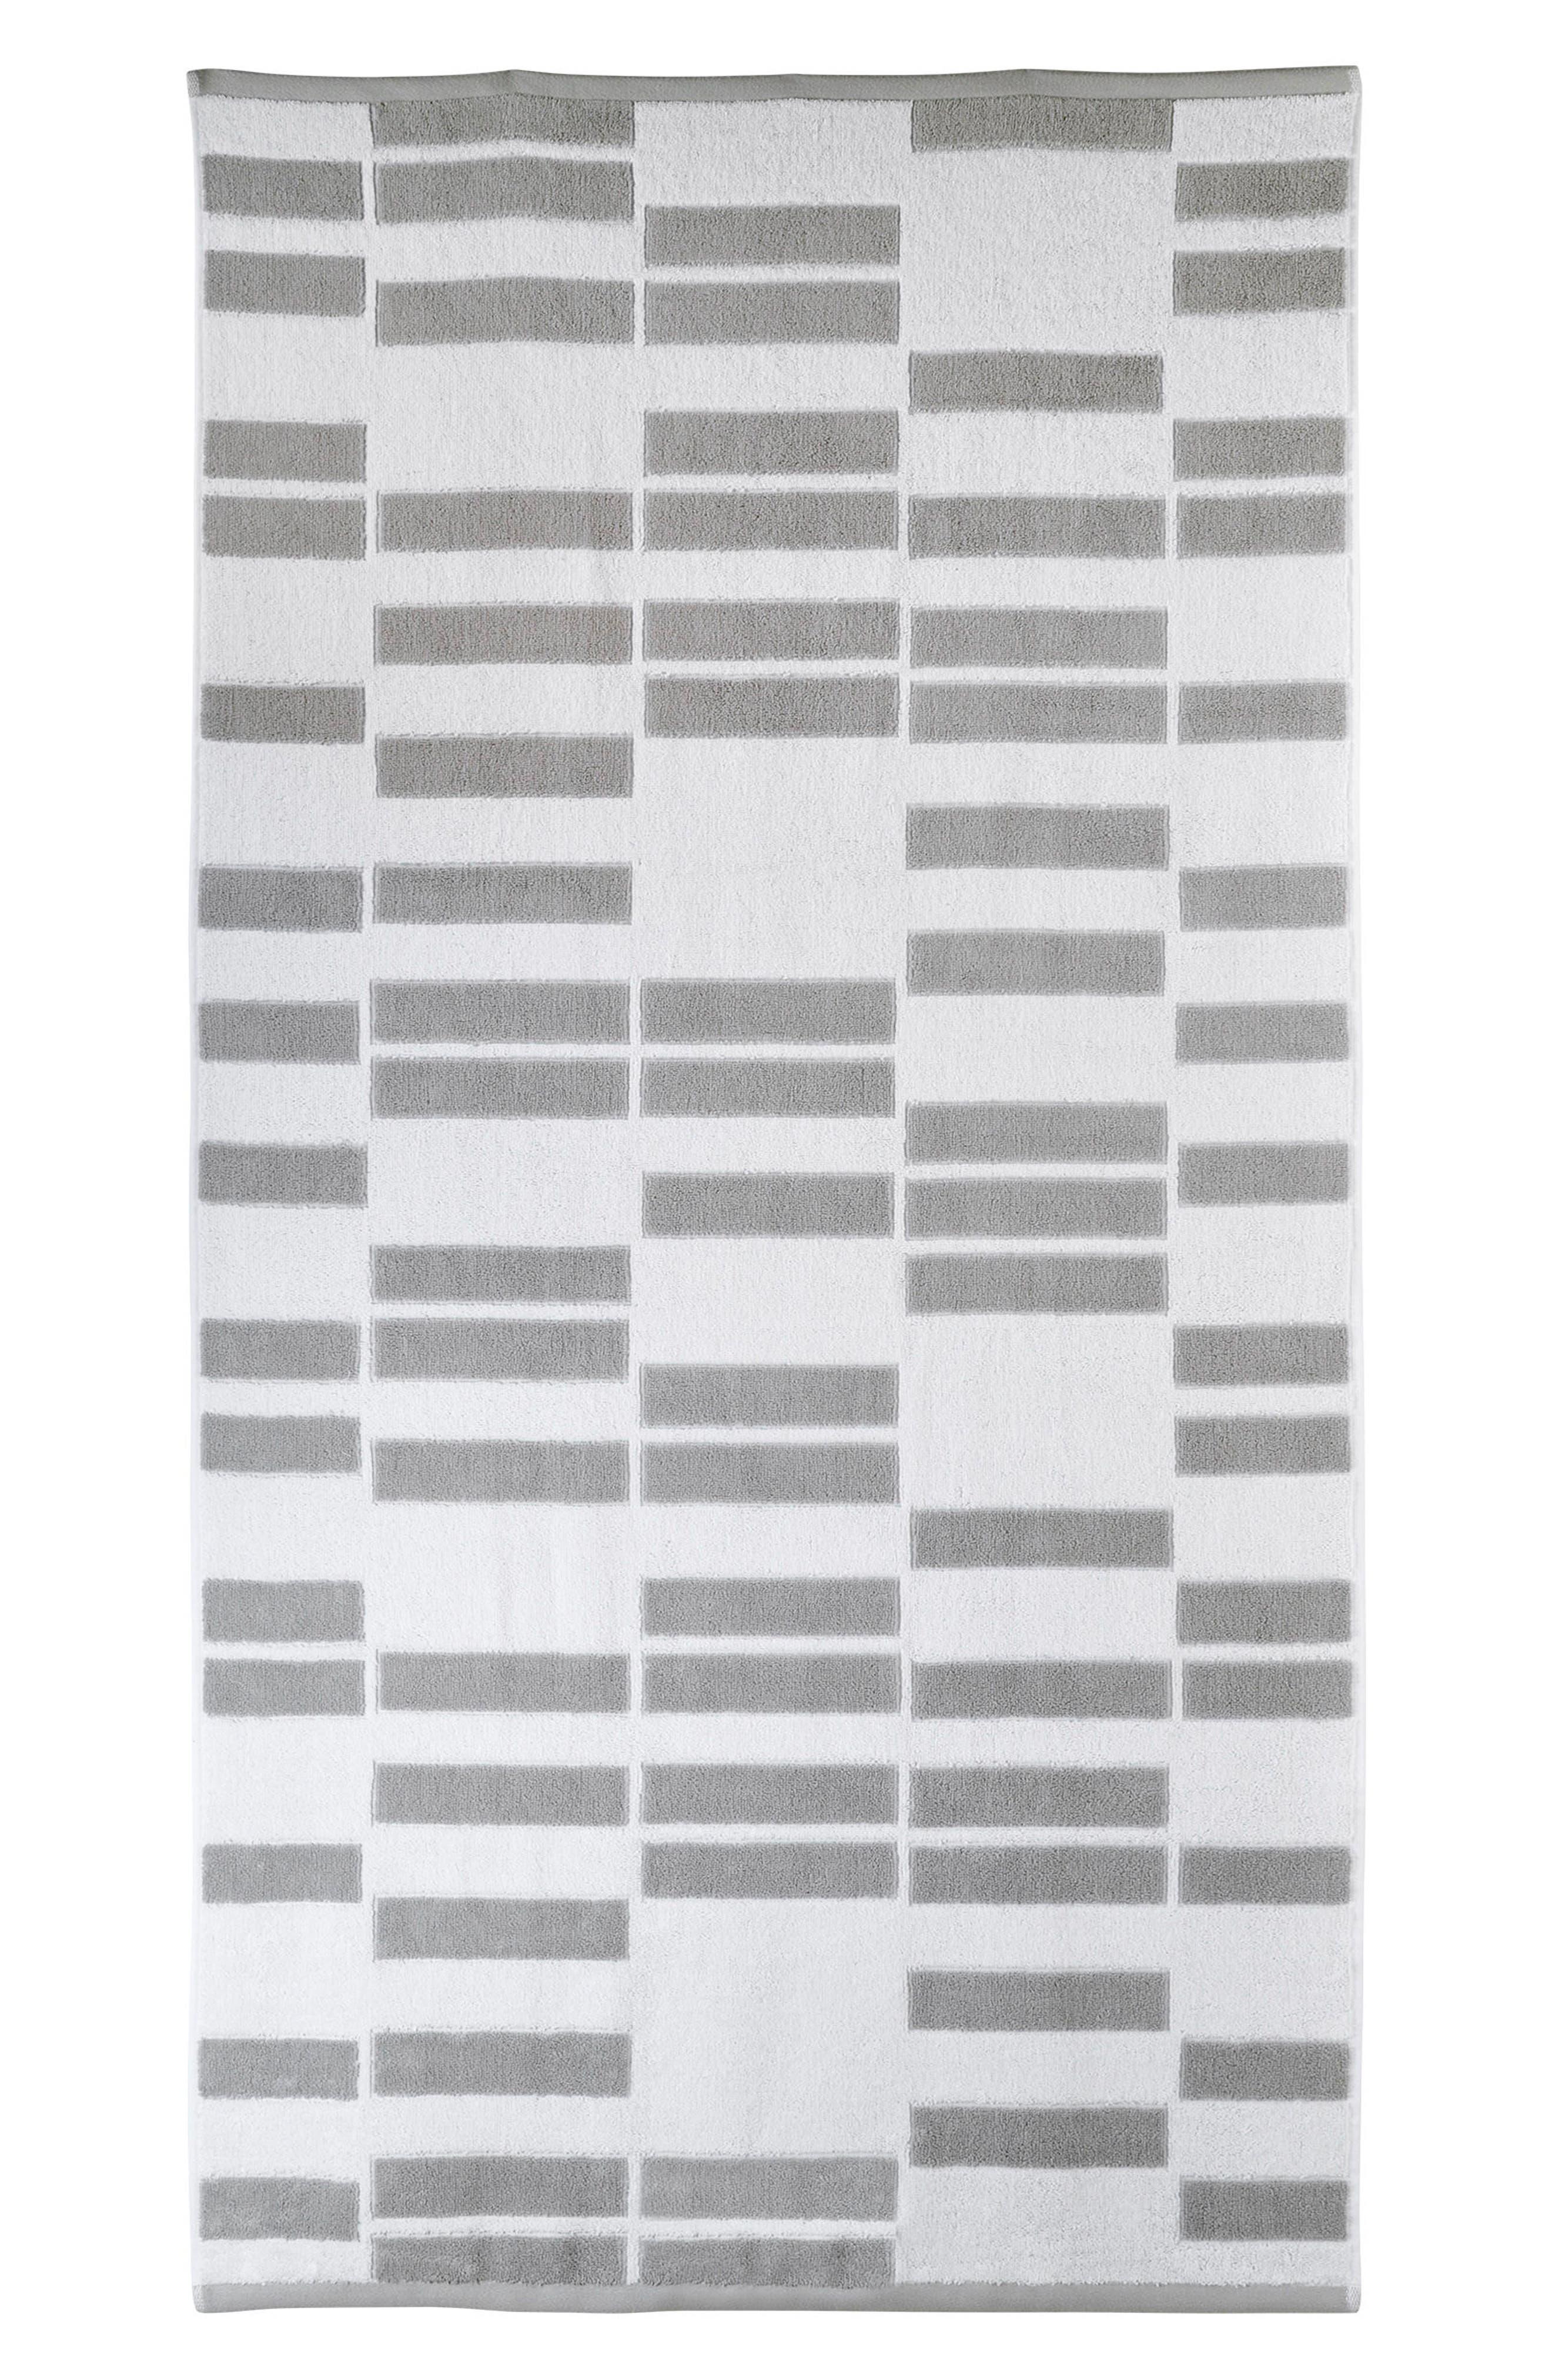 High Rise Fingertip Towel,                         Main,                         color, White/ Smoke